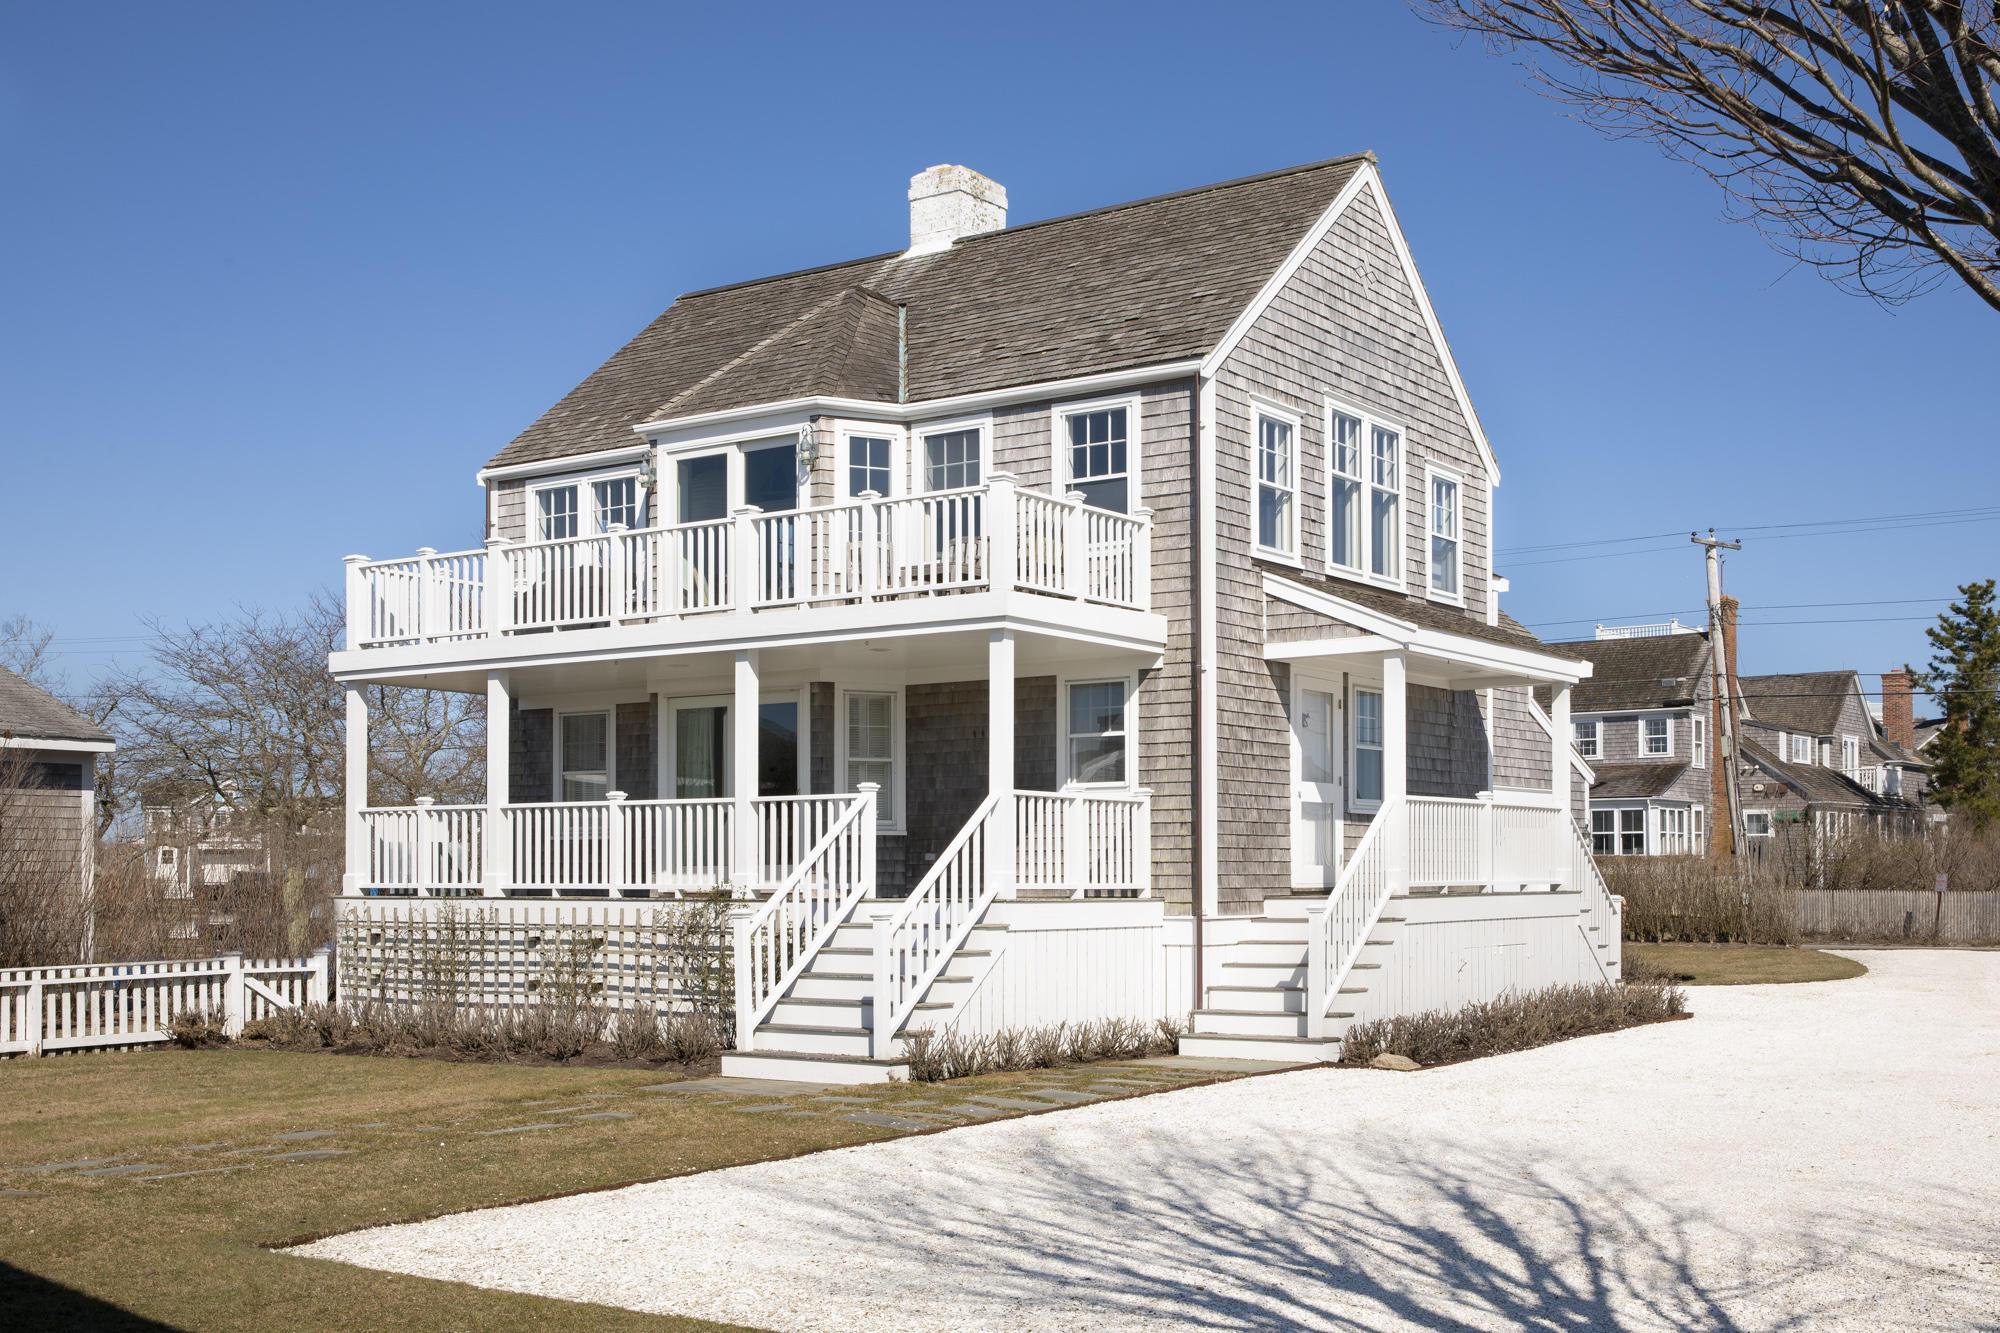 16 Easton Street, Nantucket, Massachusetts, 02554, 8 Bedrooms Bedrooms, ,7 BathroomsBathrooms,Residential,For Sale,16 Easton Street,22002983